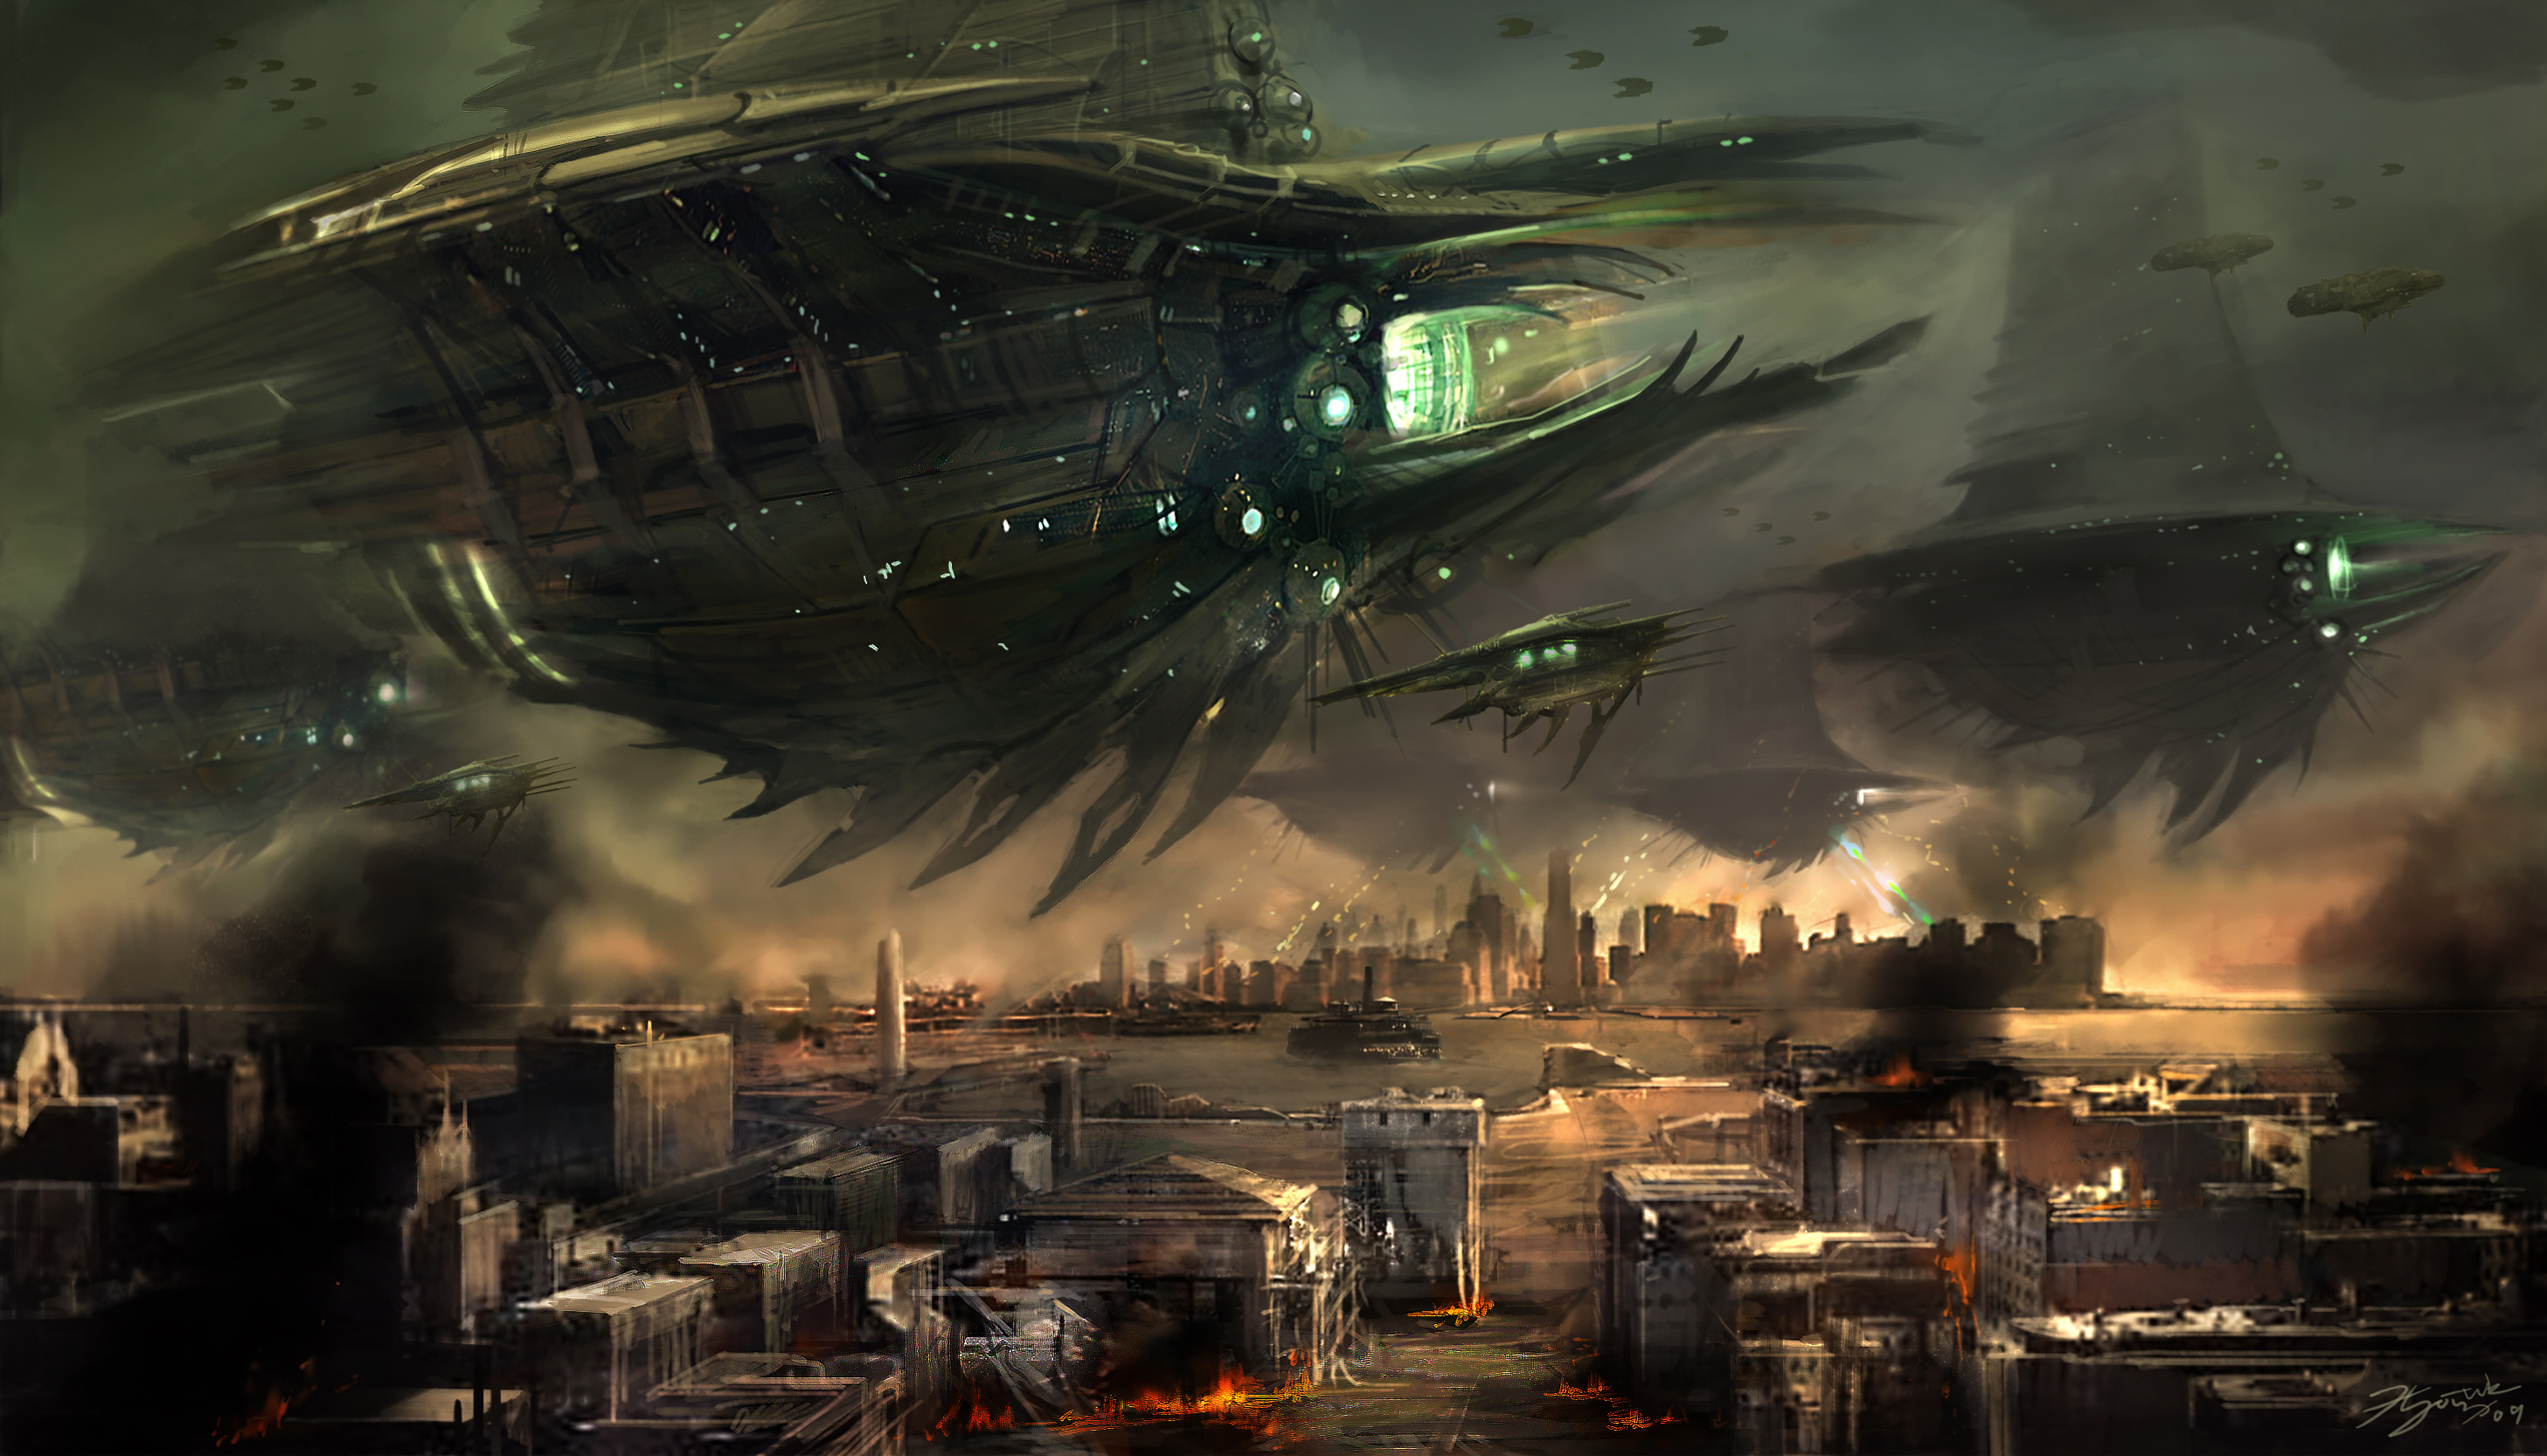 Resistance: Burning Skies - Resistance: Burning Skies 2K, Арт